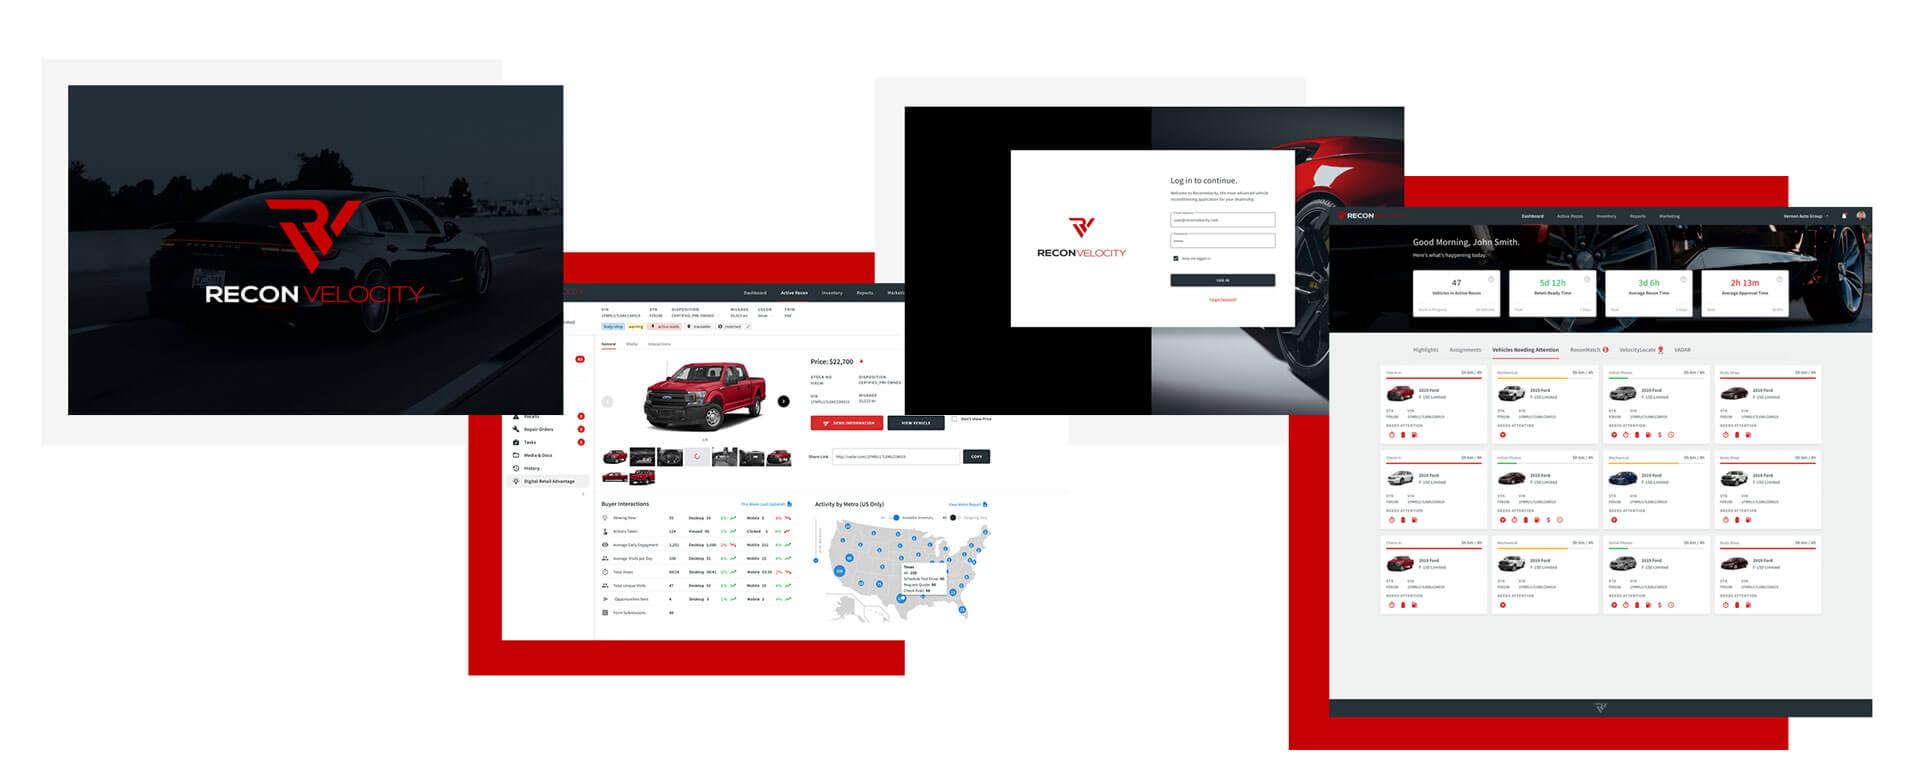 Various ReconVelocity screenshots from the web app.